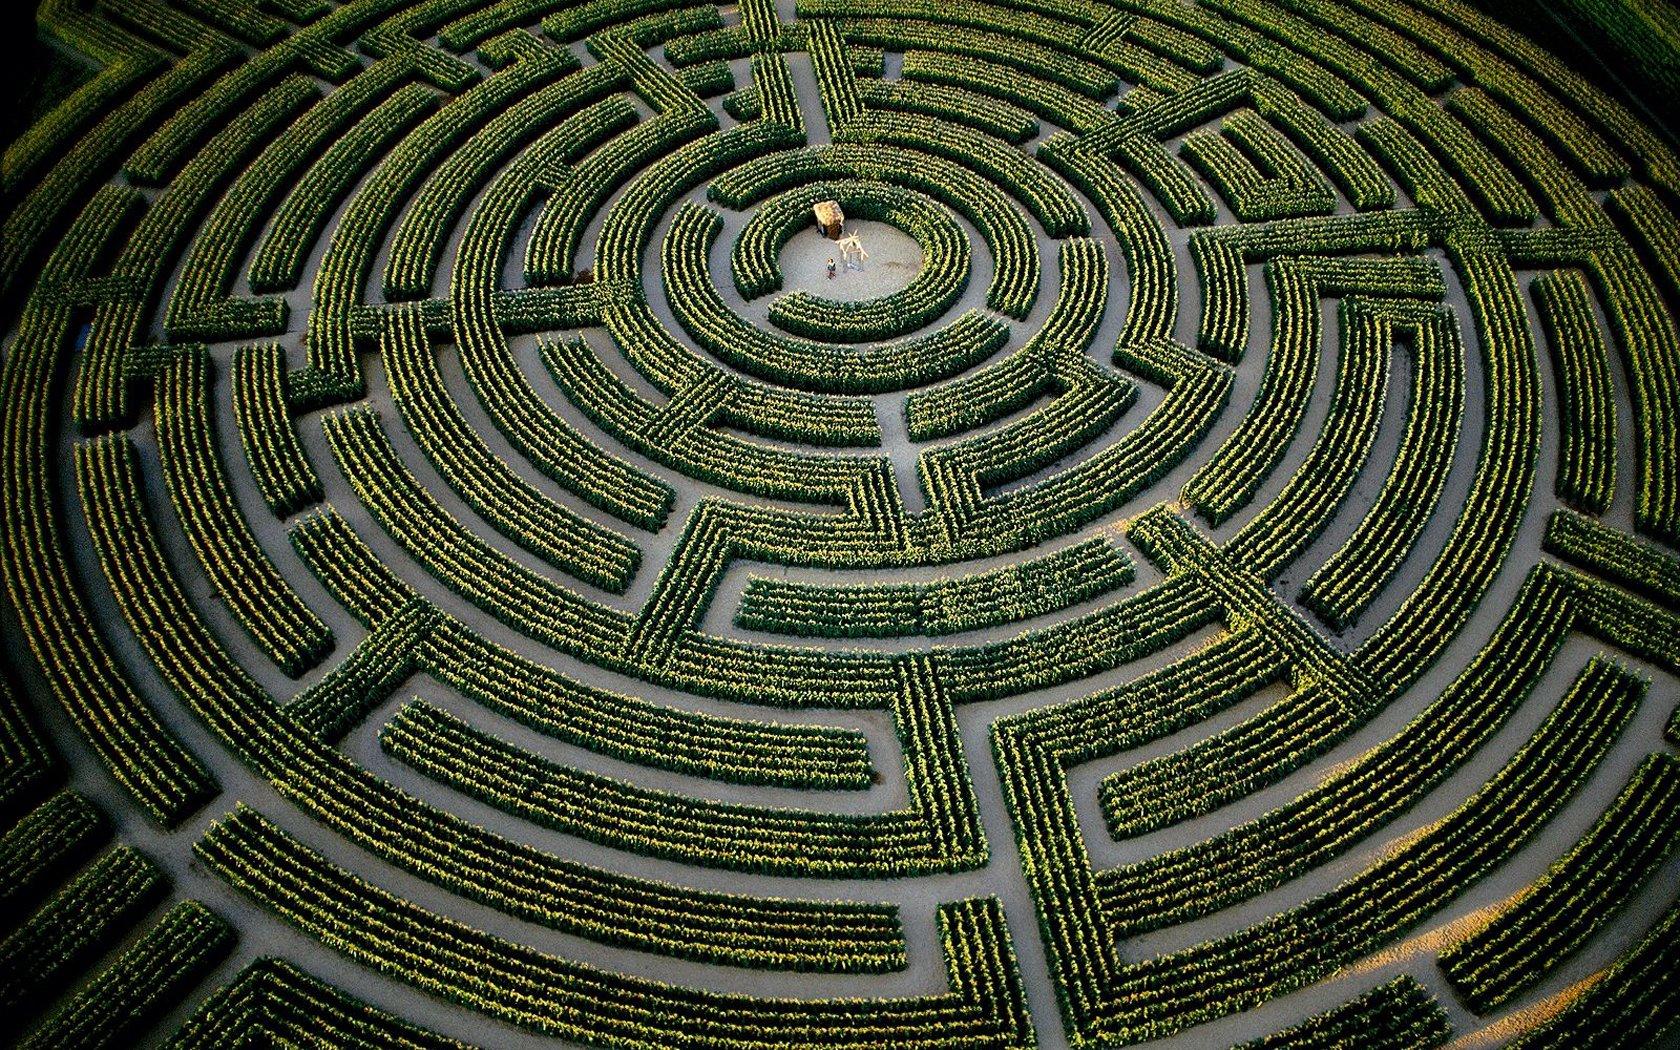 the-largest-plant-maze-in-the-world-at-reignac-sur-indre-indre-et-loire-department-france